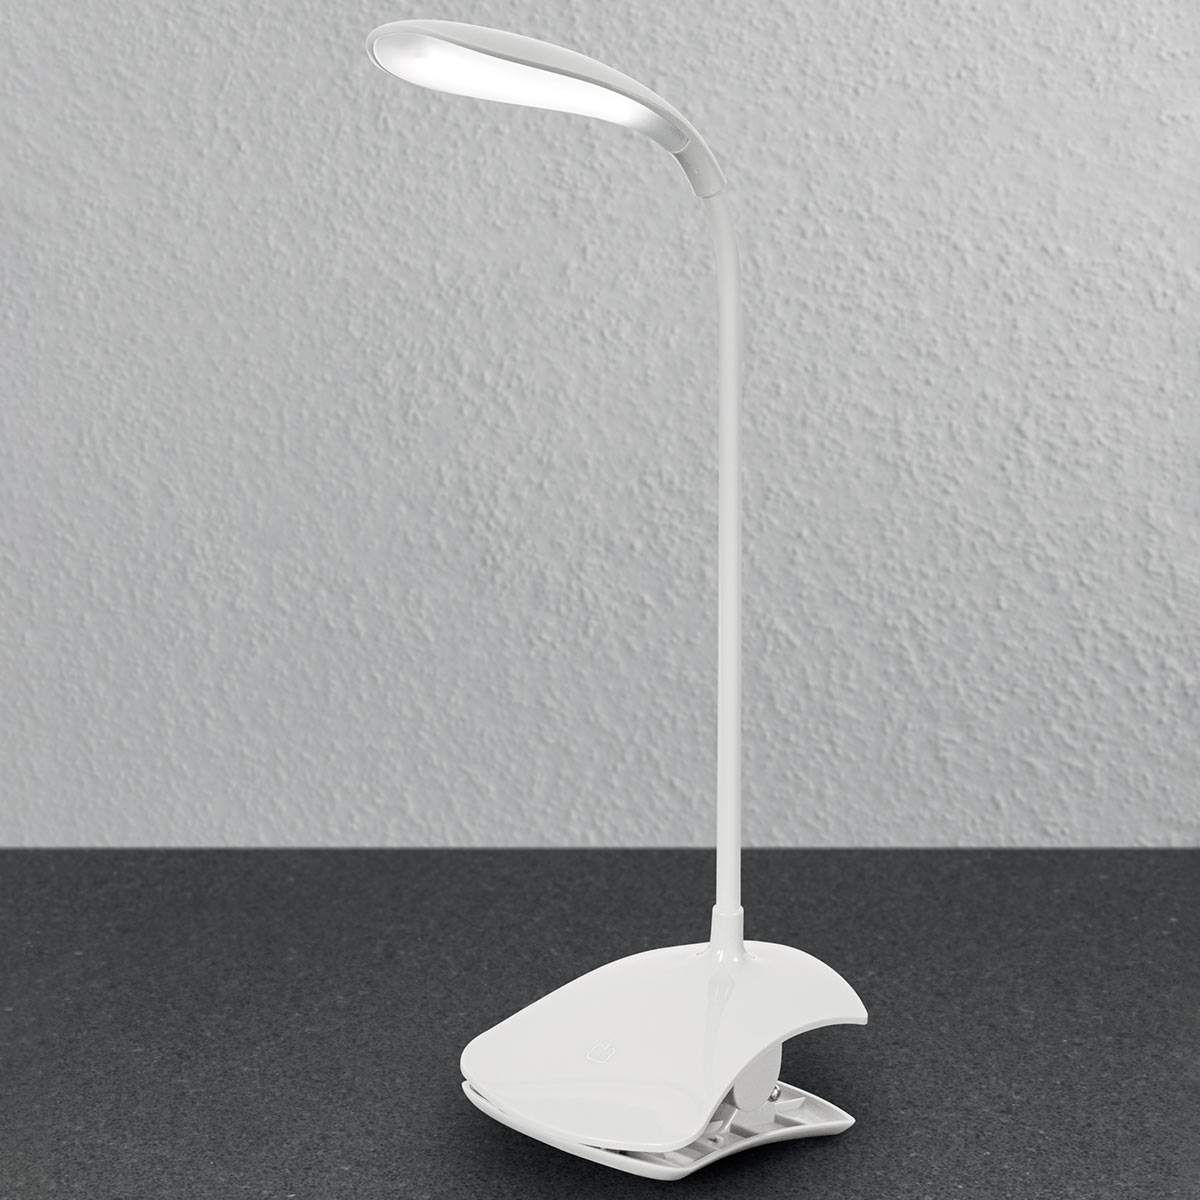 Osram Panan Clip Batteriebetriebene Led Tischlampe Jetzt Bestellen Unter Https Moebel Ladendirekt De Lampen Tischleuchten Beiste Lampe Led Tischlampe Lampen